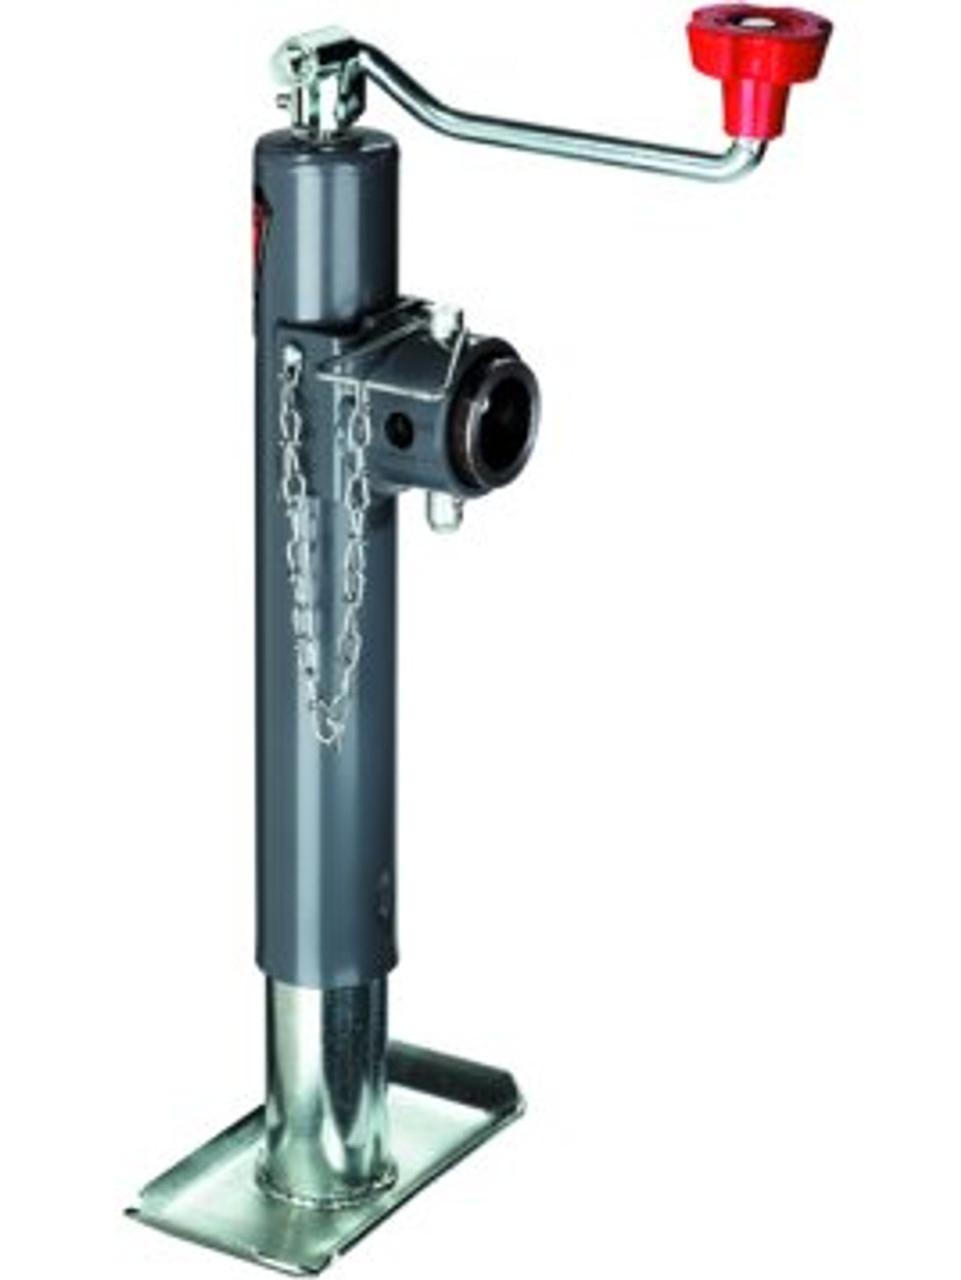 158451 --- BULLDOG Swivel Topwind Trailer Jack - 2000 lb